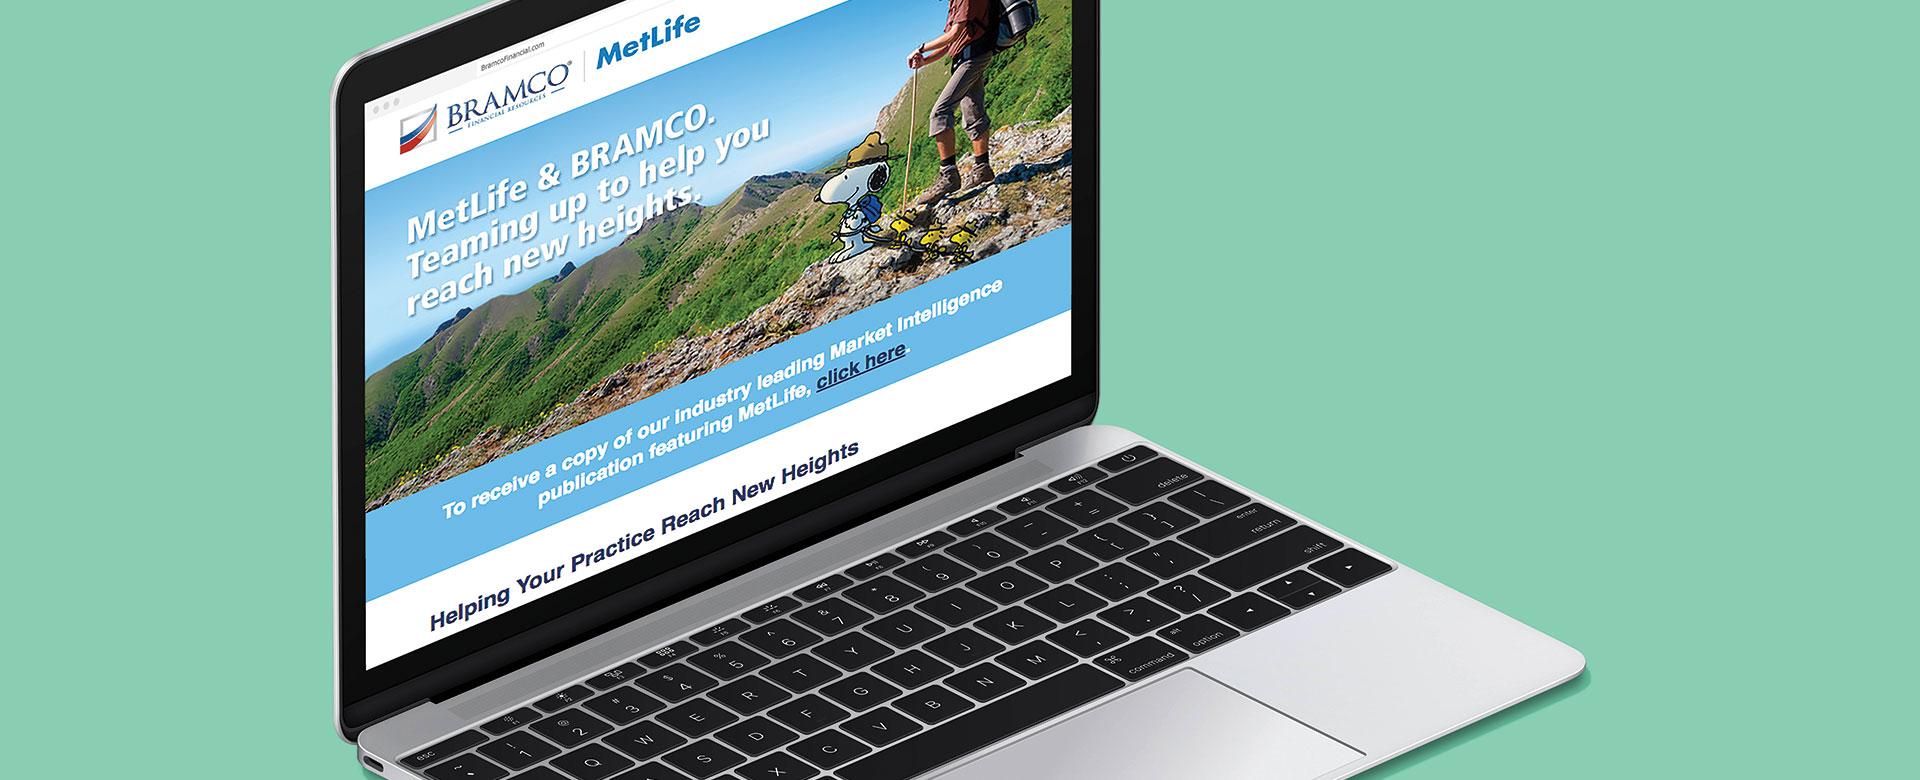 Bramco MetLife Co-Branded Miami Advertising Webpage